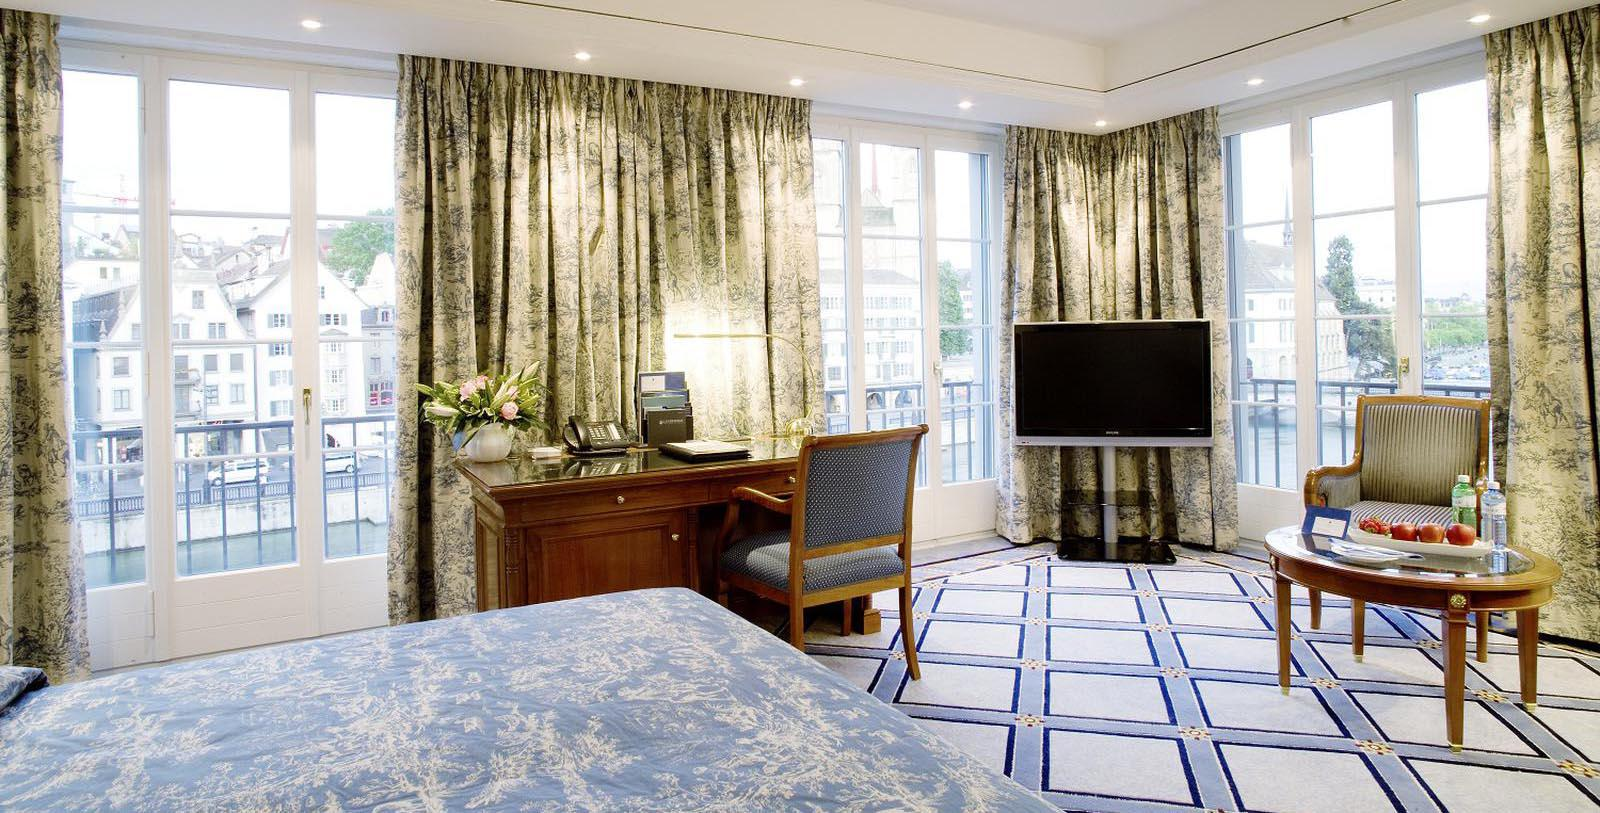 Image of Guestroom at Storchen Zürich, 1357, Member of Historic Hotels Worldwide, in Zurich, Switzerland, Accommodations